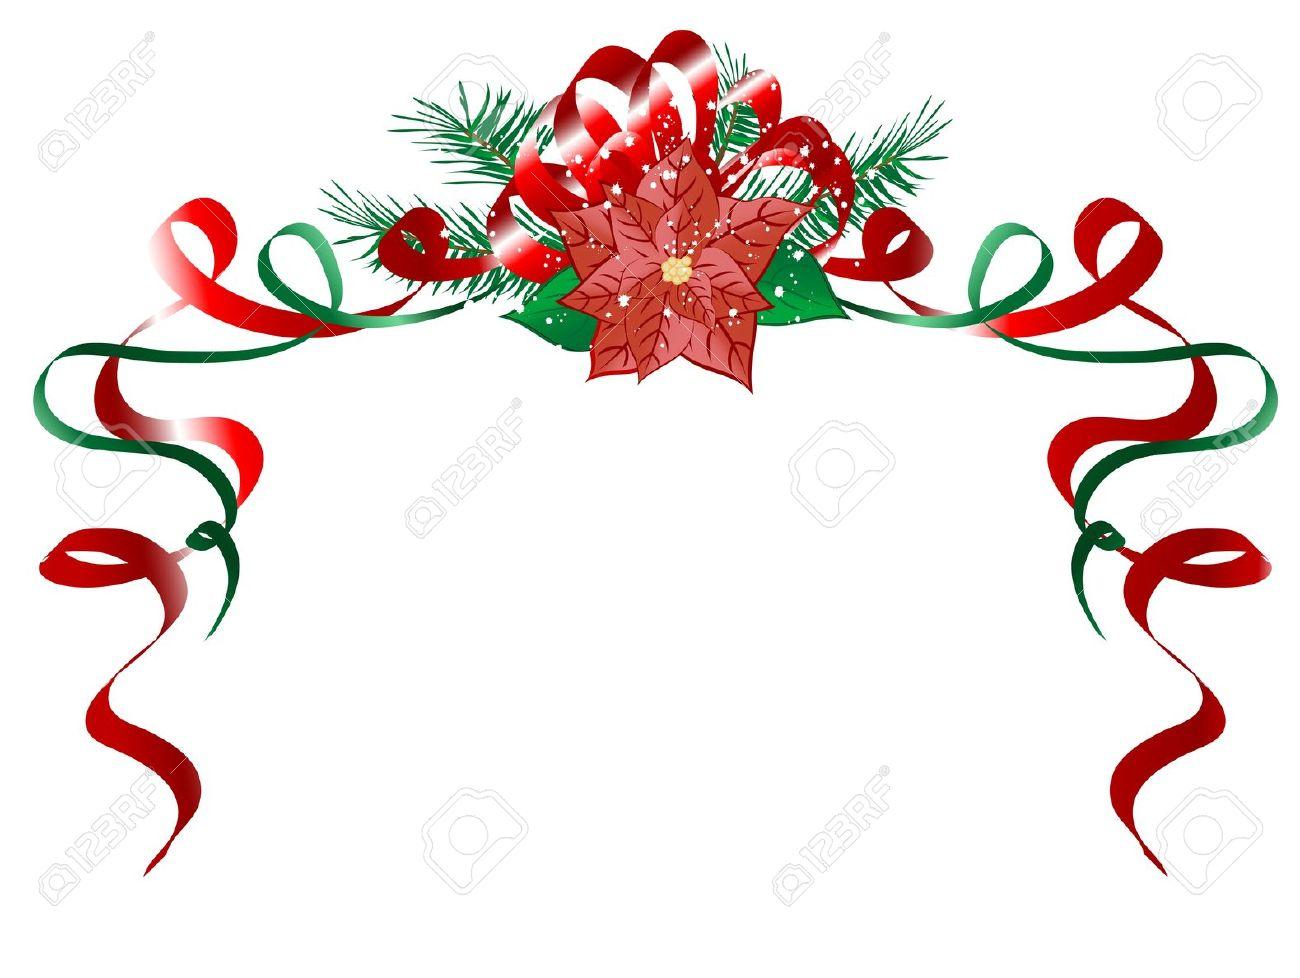 Poinsettia clipart horizontal flower border Horizontal Happy – (15) Poinsettia